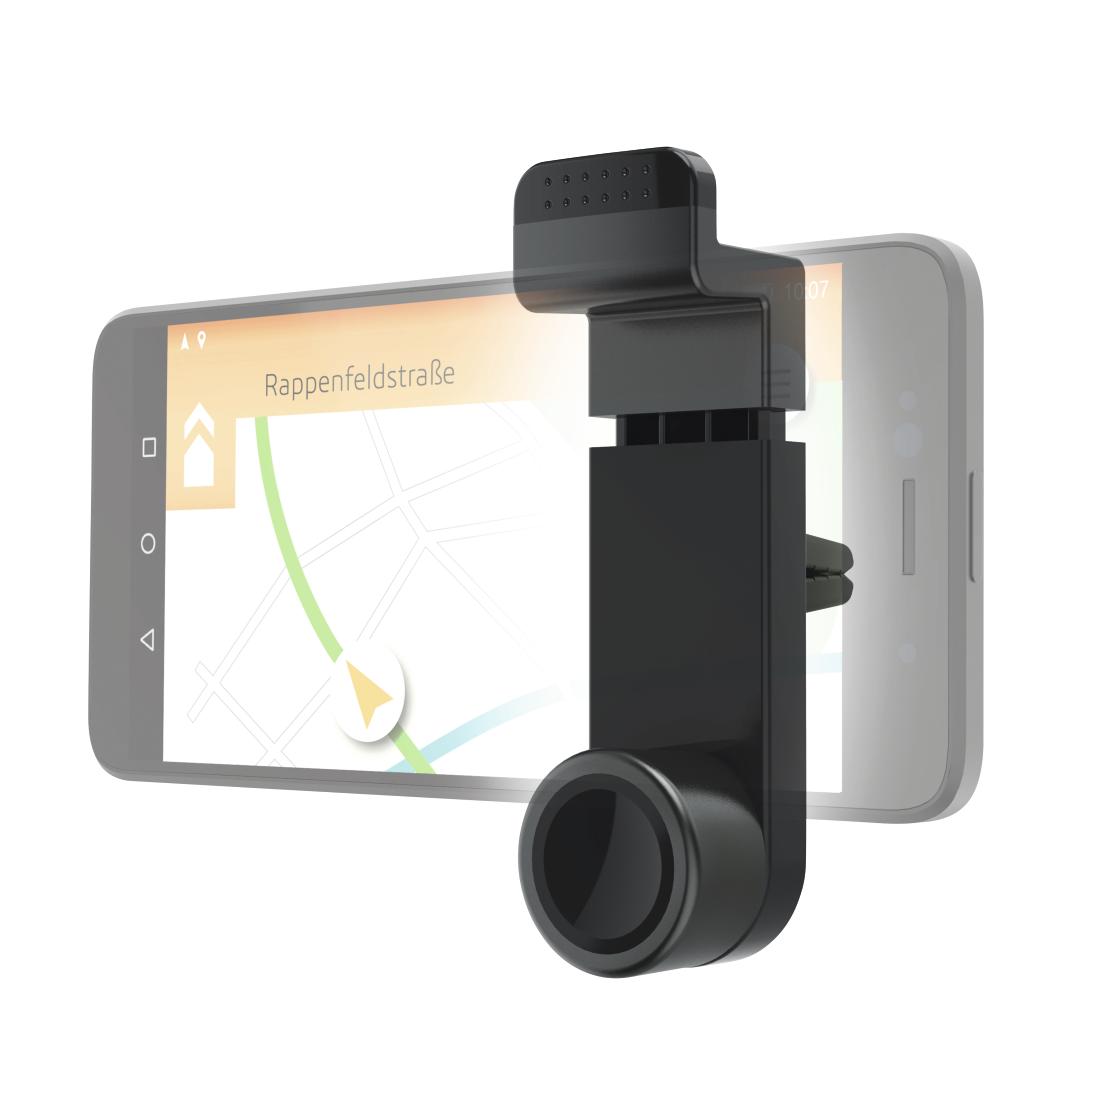 00173890 hama uni smartphone halter flipper ger te mit breite 4 8 9 12 st display hama de. Black Bedroom Furniture Sets. Home Design Ideas